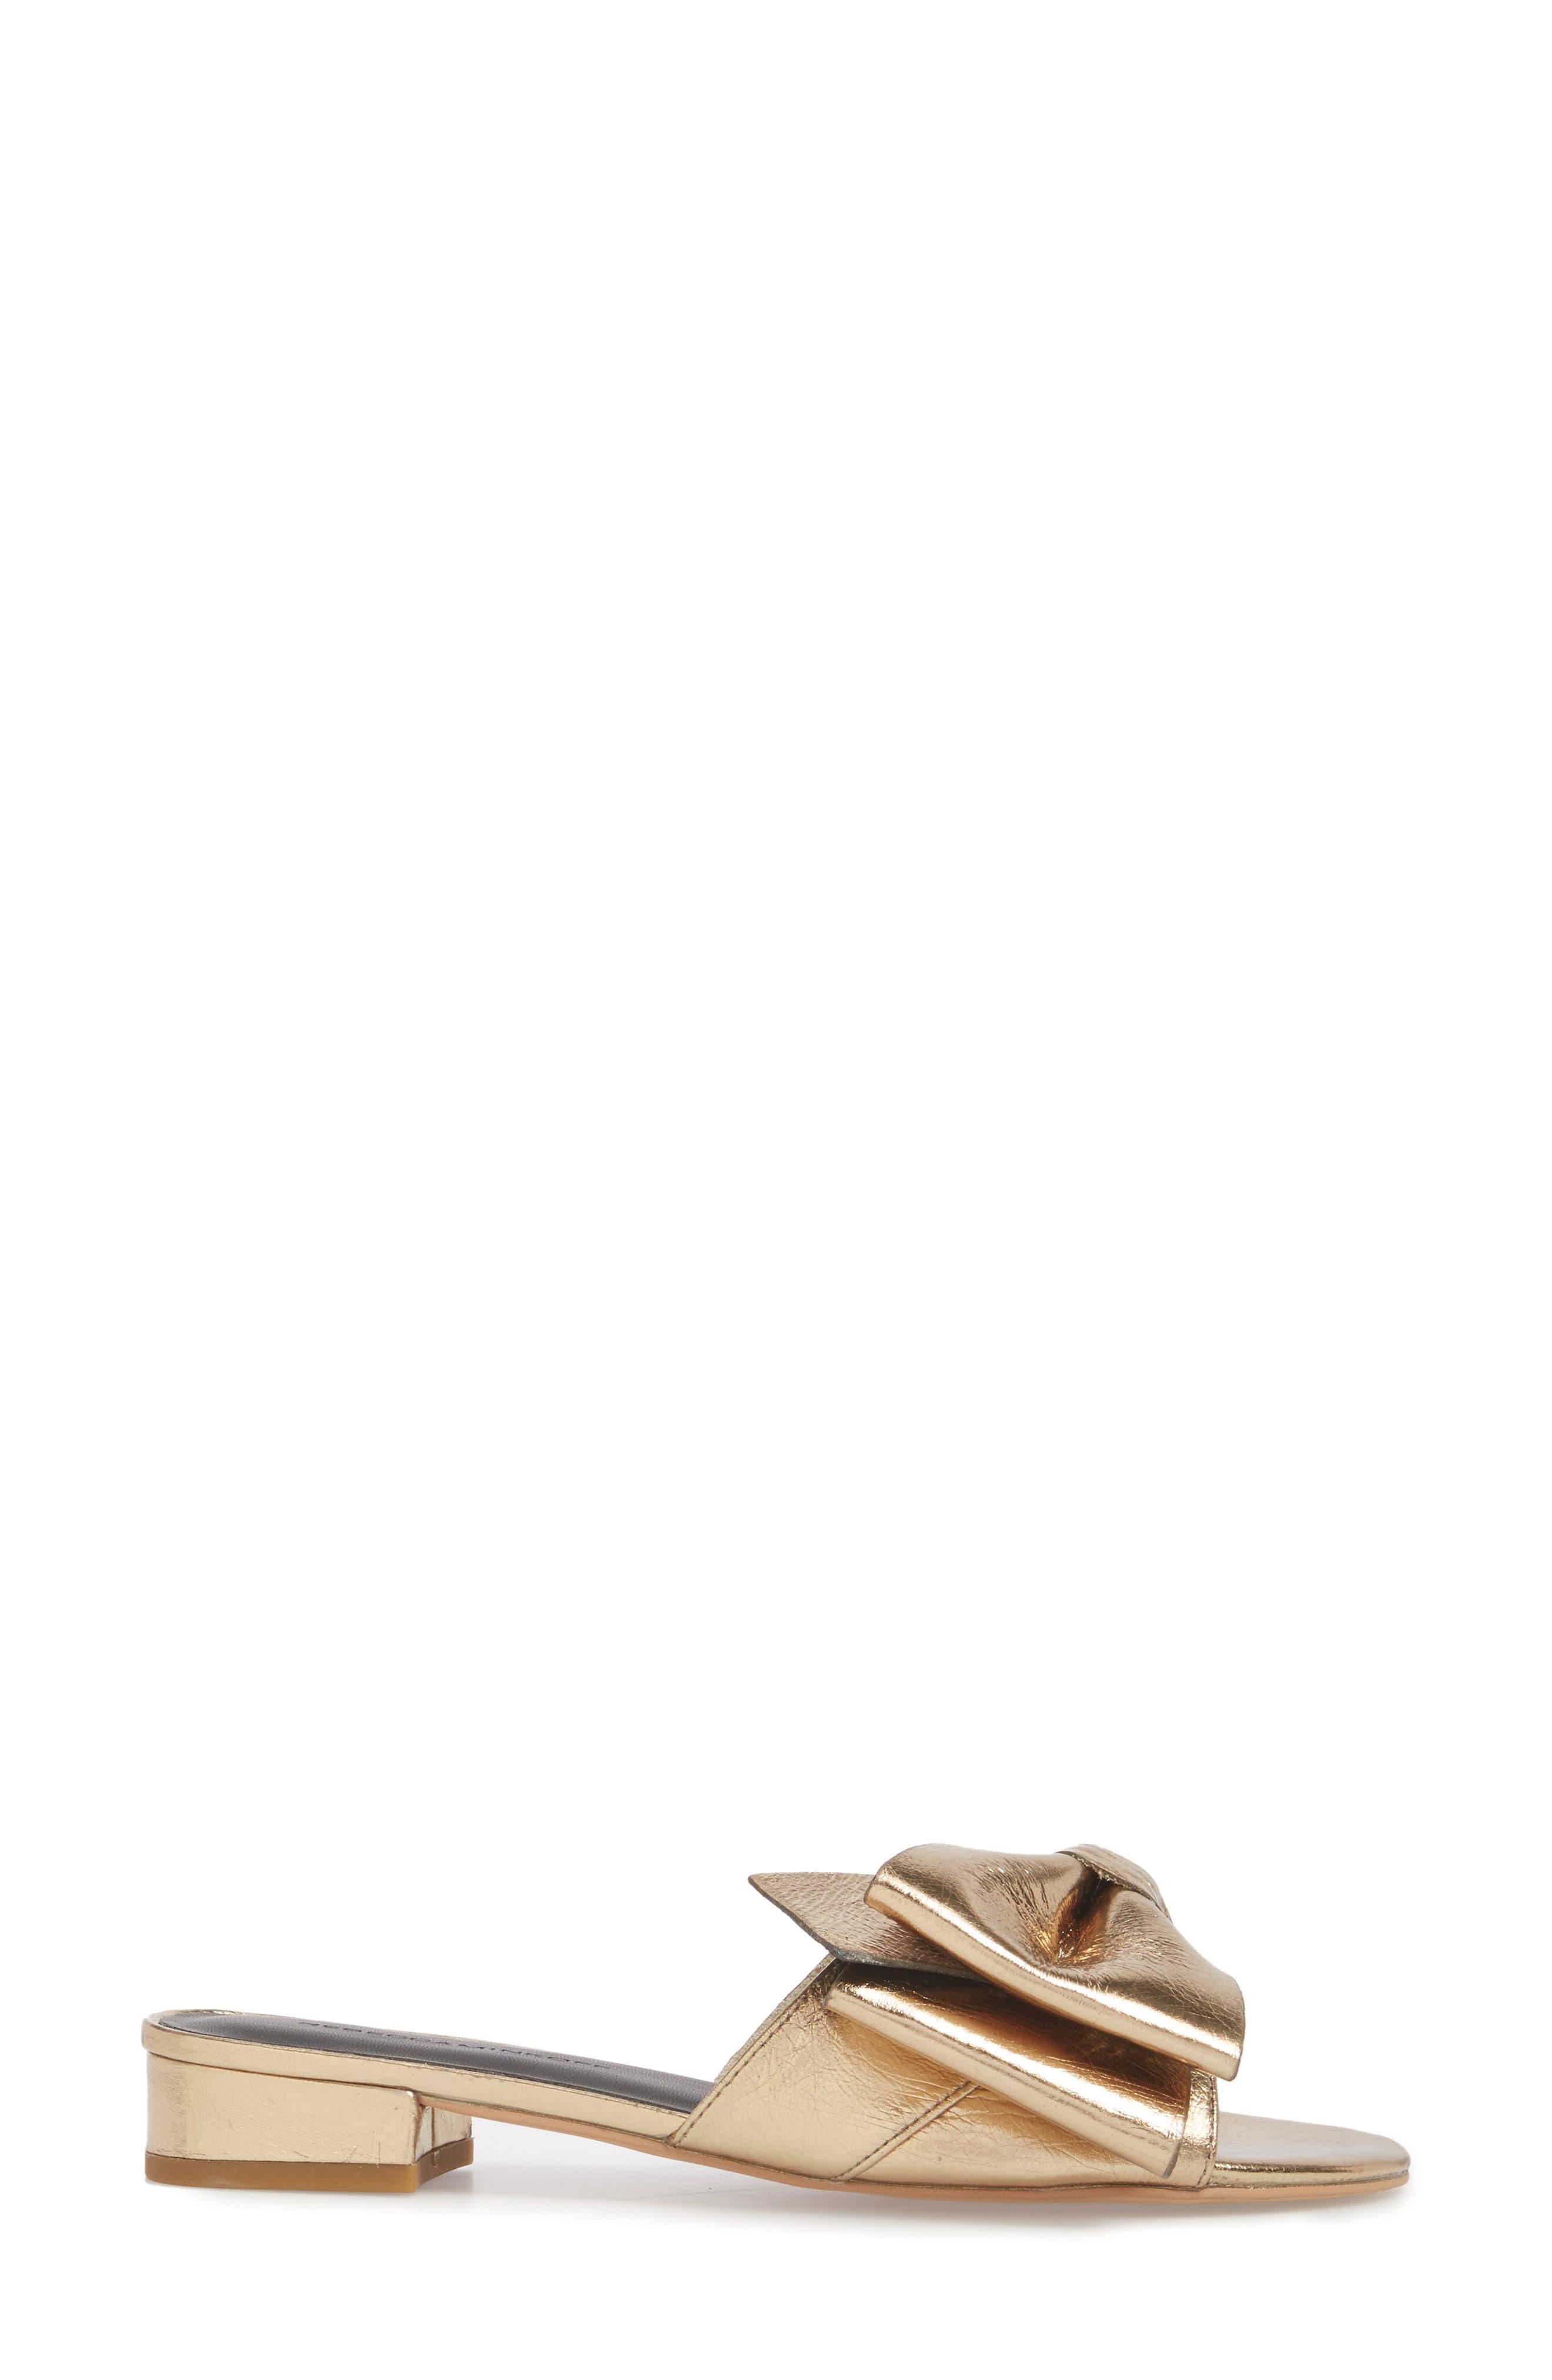 Calista Sandal,                             Alternate thumbnail 3, color,                             Gold Metallic Leather